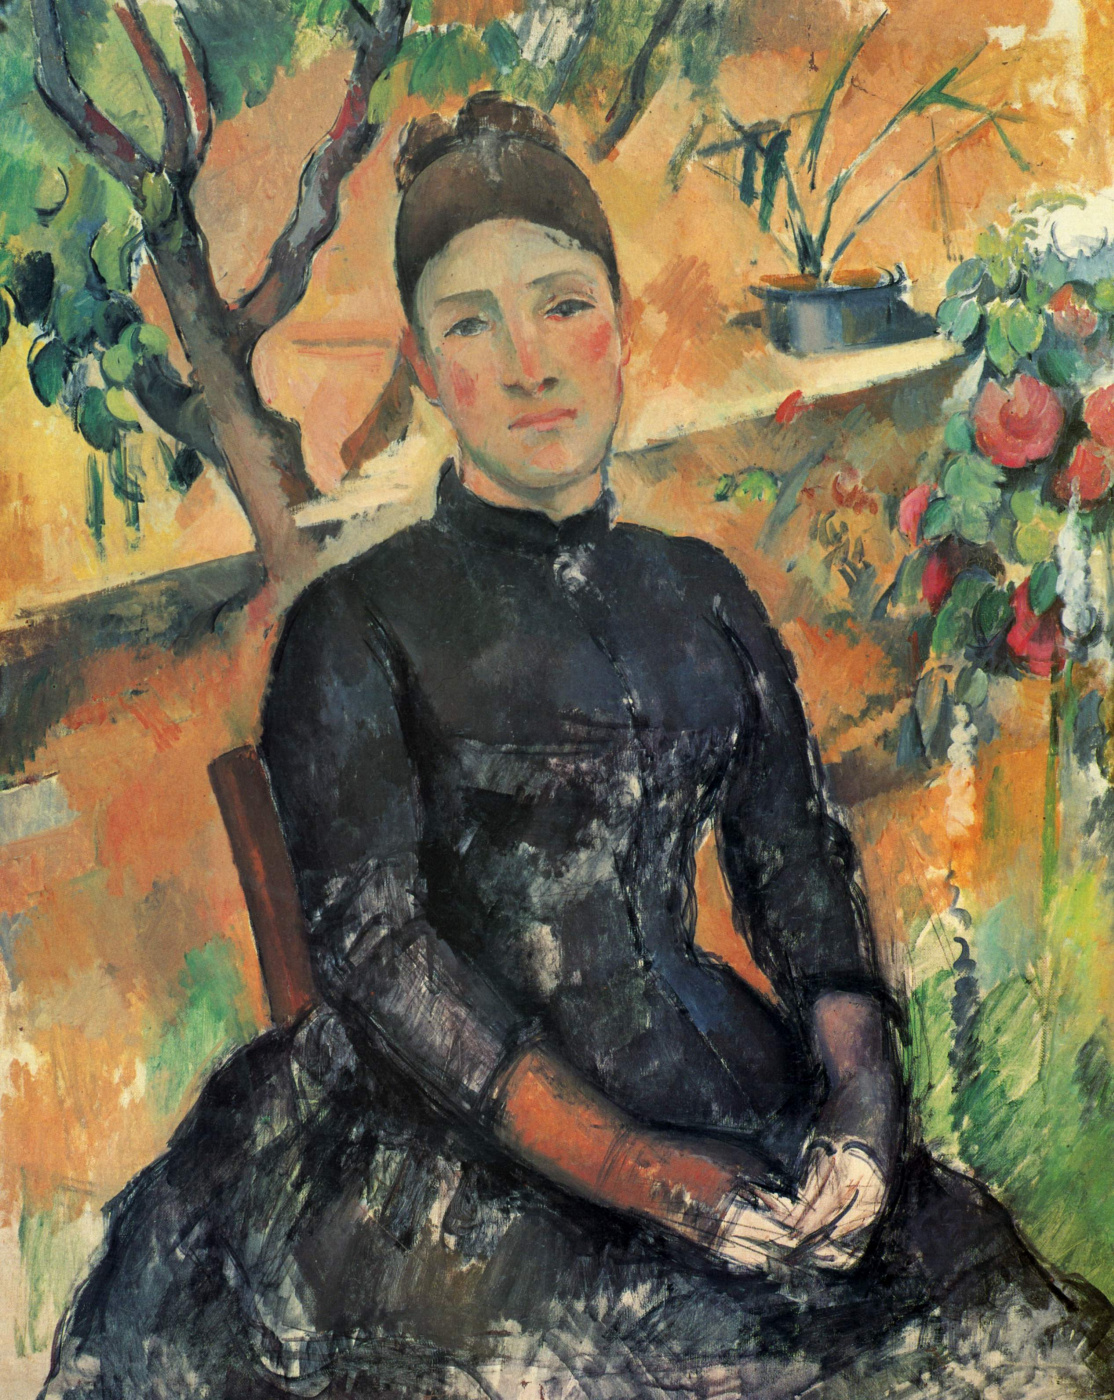 Paul Cezanne. Madame Cezanne in the greenhouse